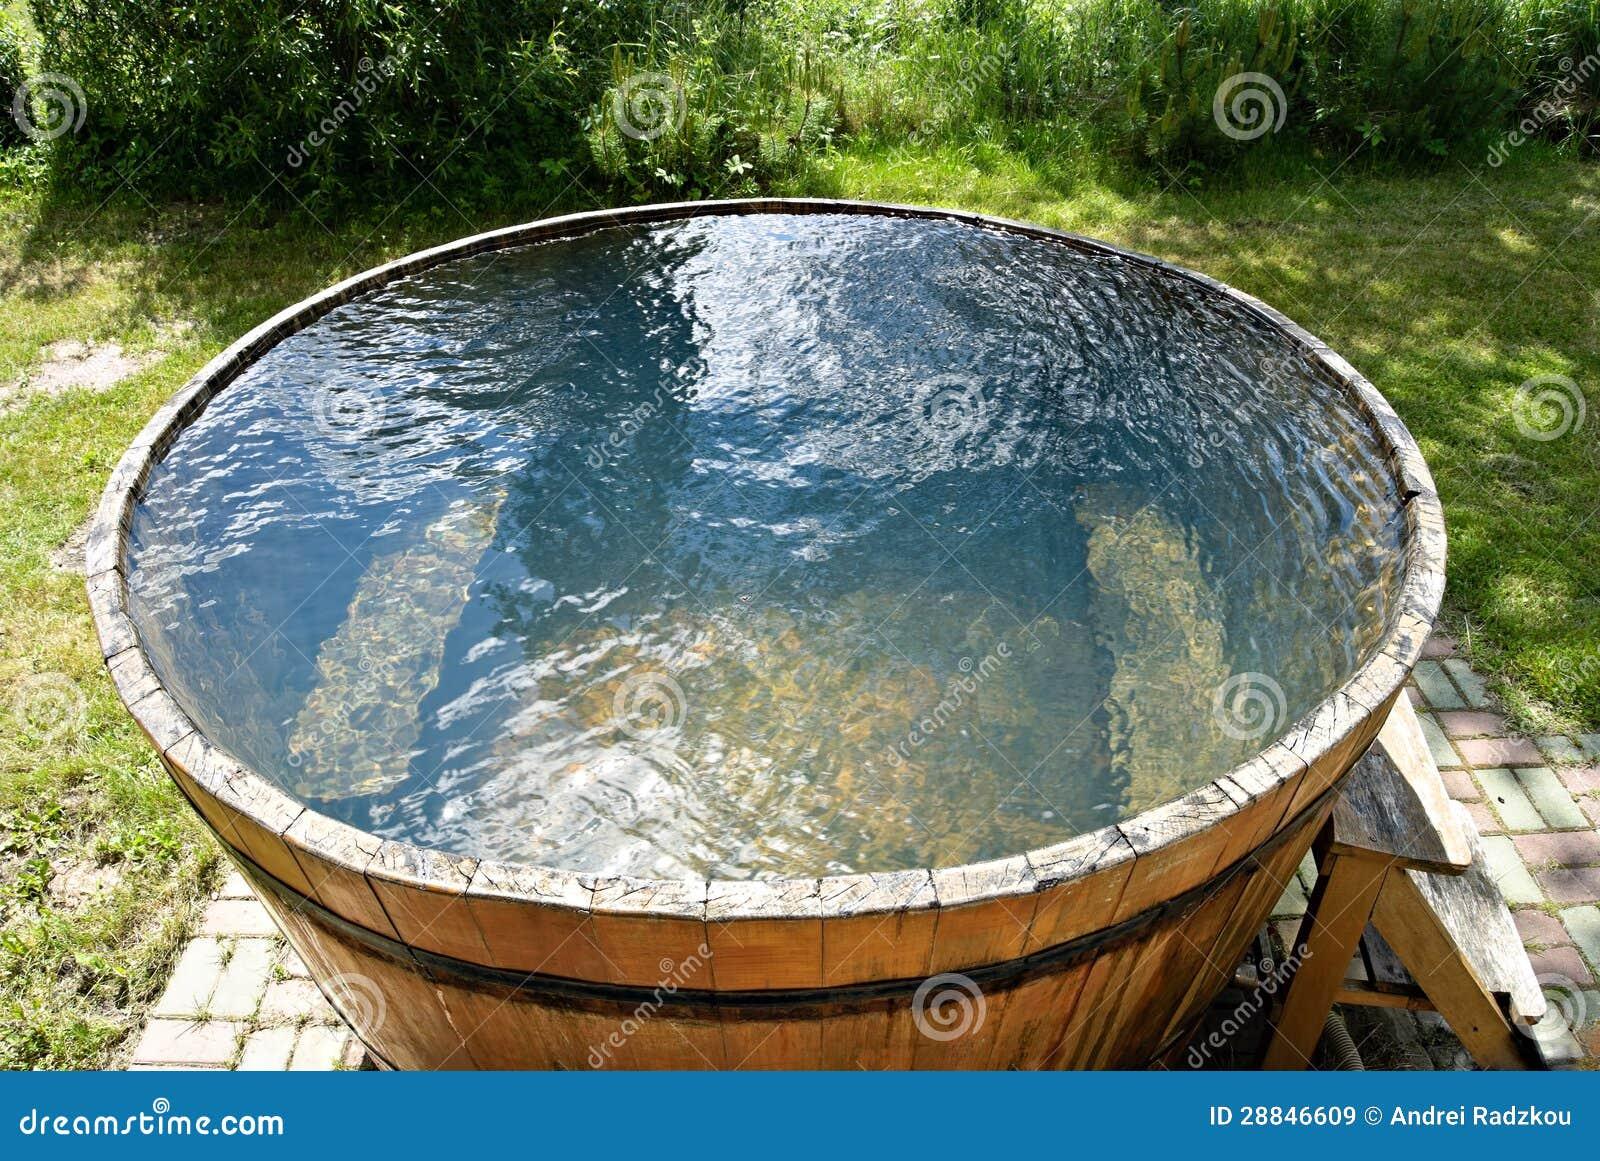 Wooden Bathtub Wooden Bathtub Royalty Free Stock Images Image 28846609